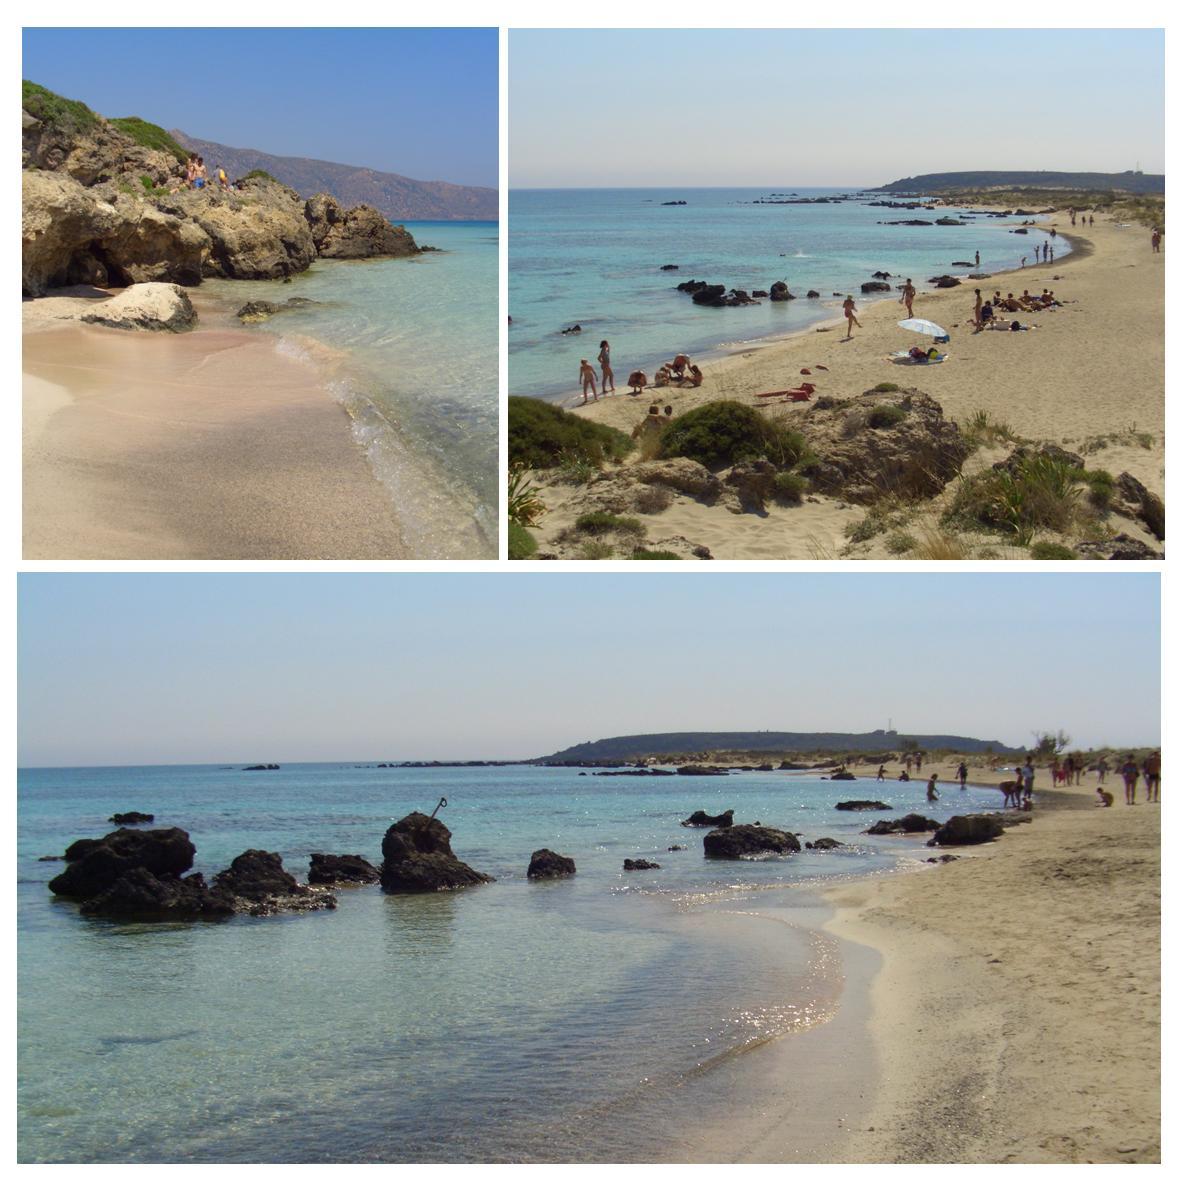 Kretas beste strand - Elafonissi